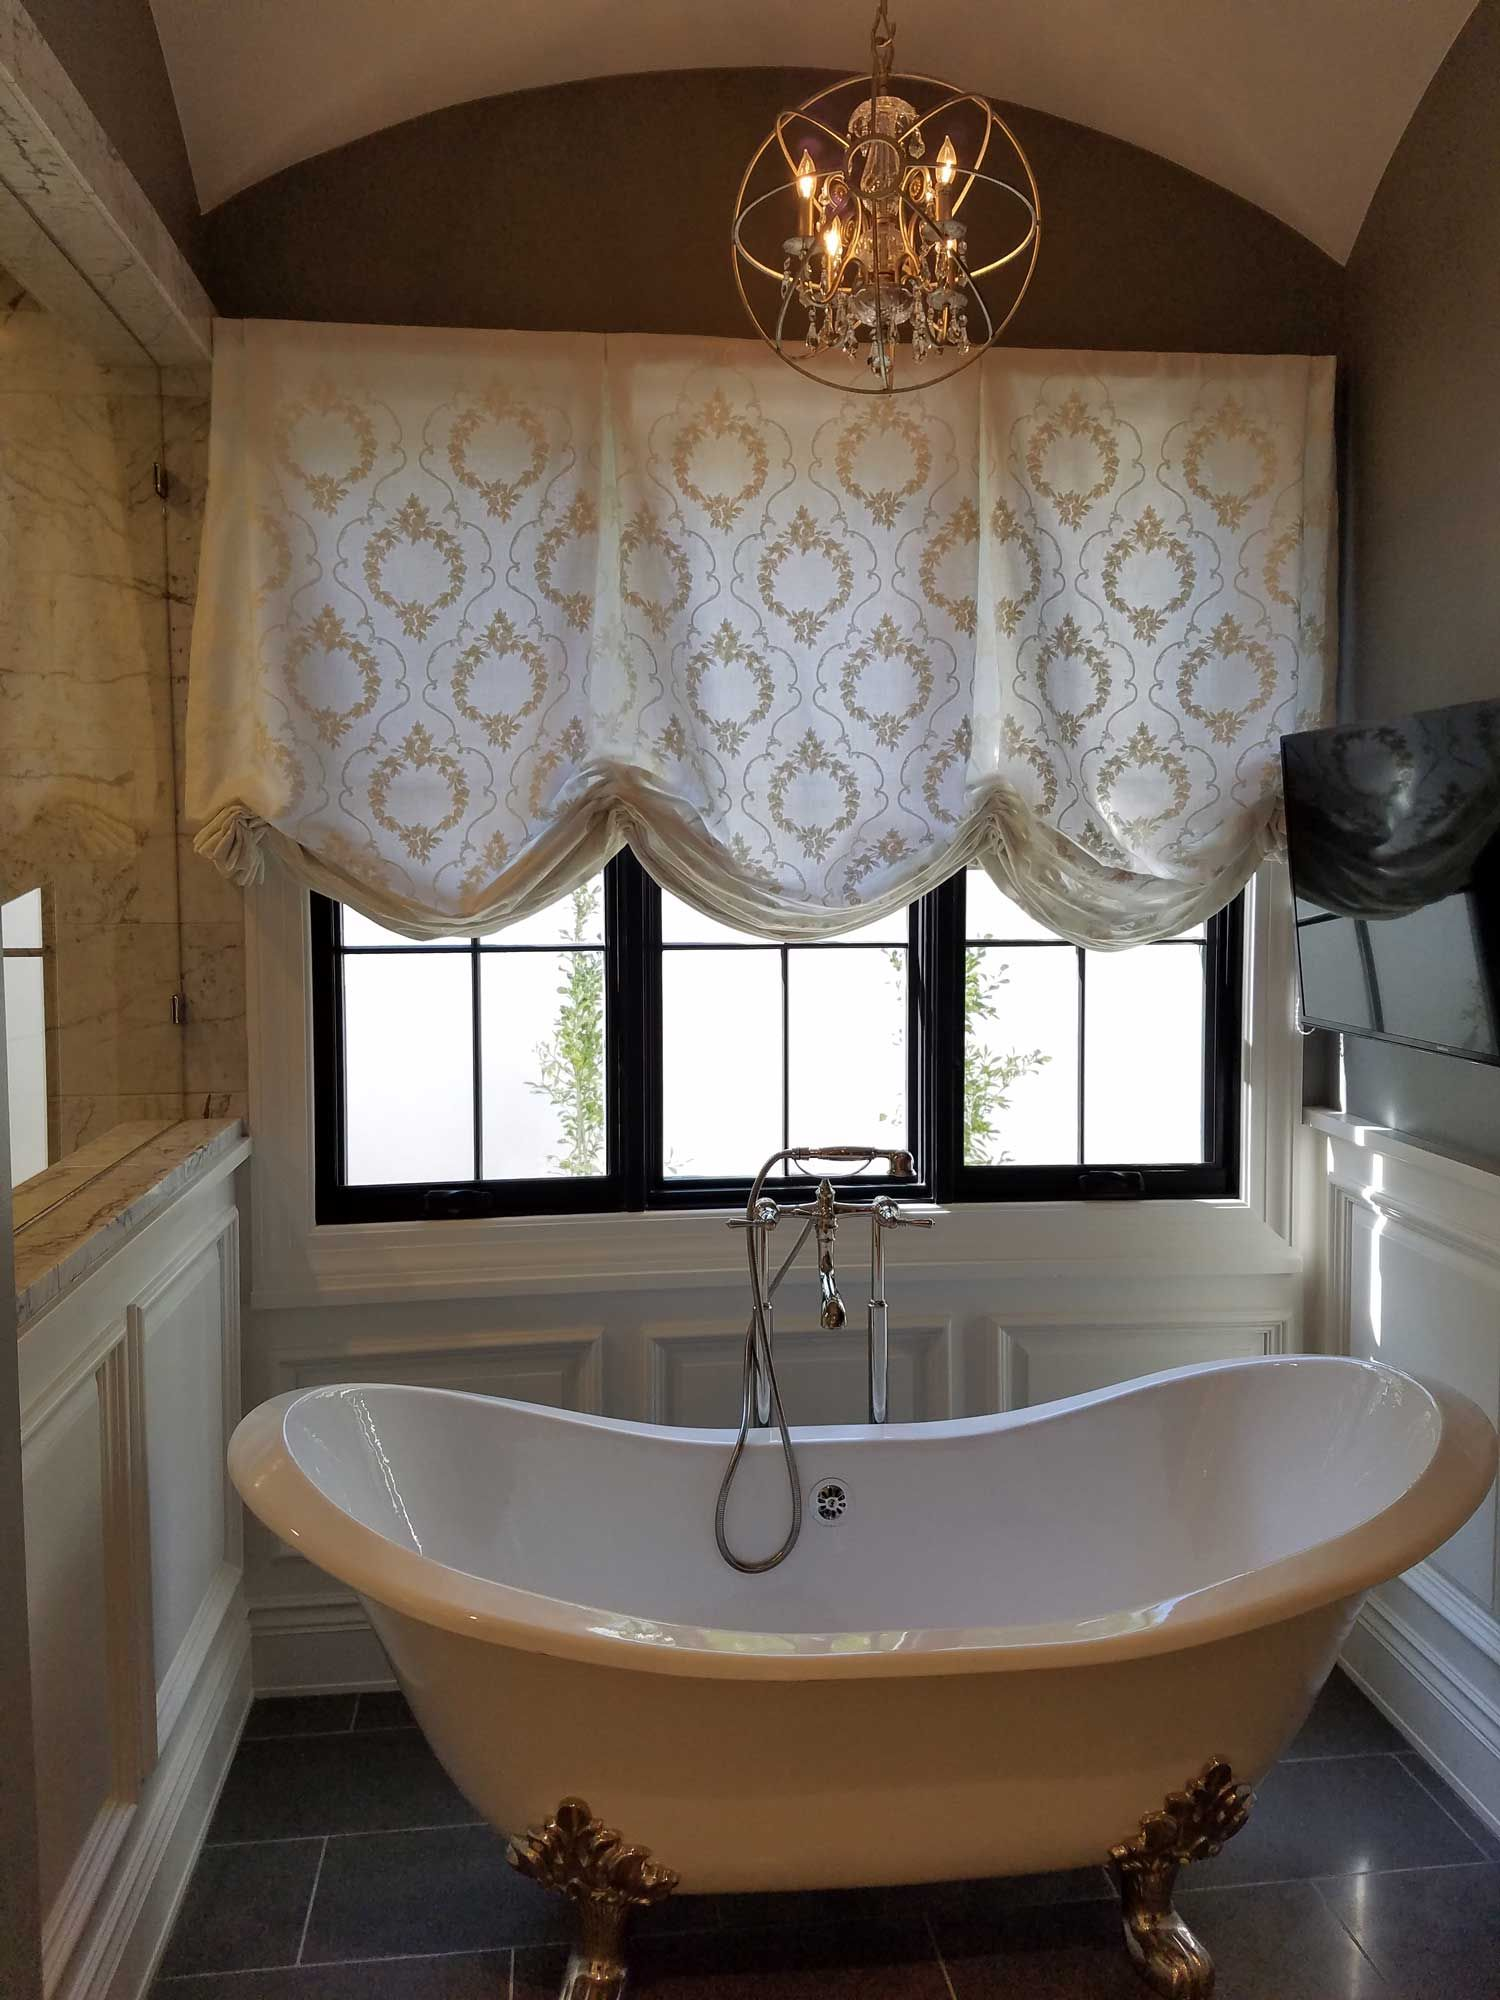 London Roman Shade Over Bathroom Window Bathroom Window Decor Curtains With Blinds Bathroom Window Curtains [ 2000 x 1500 Pixel ]